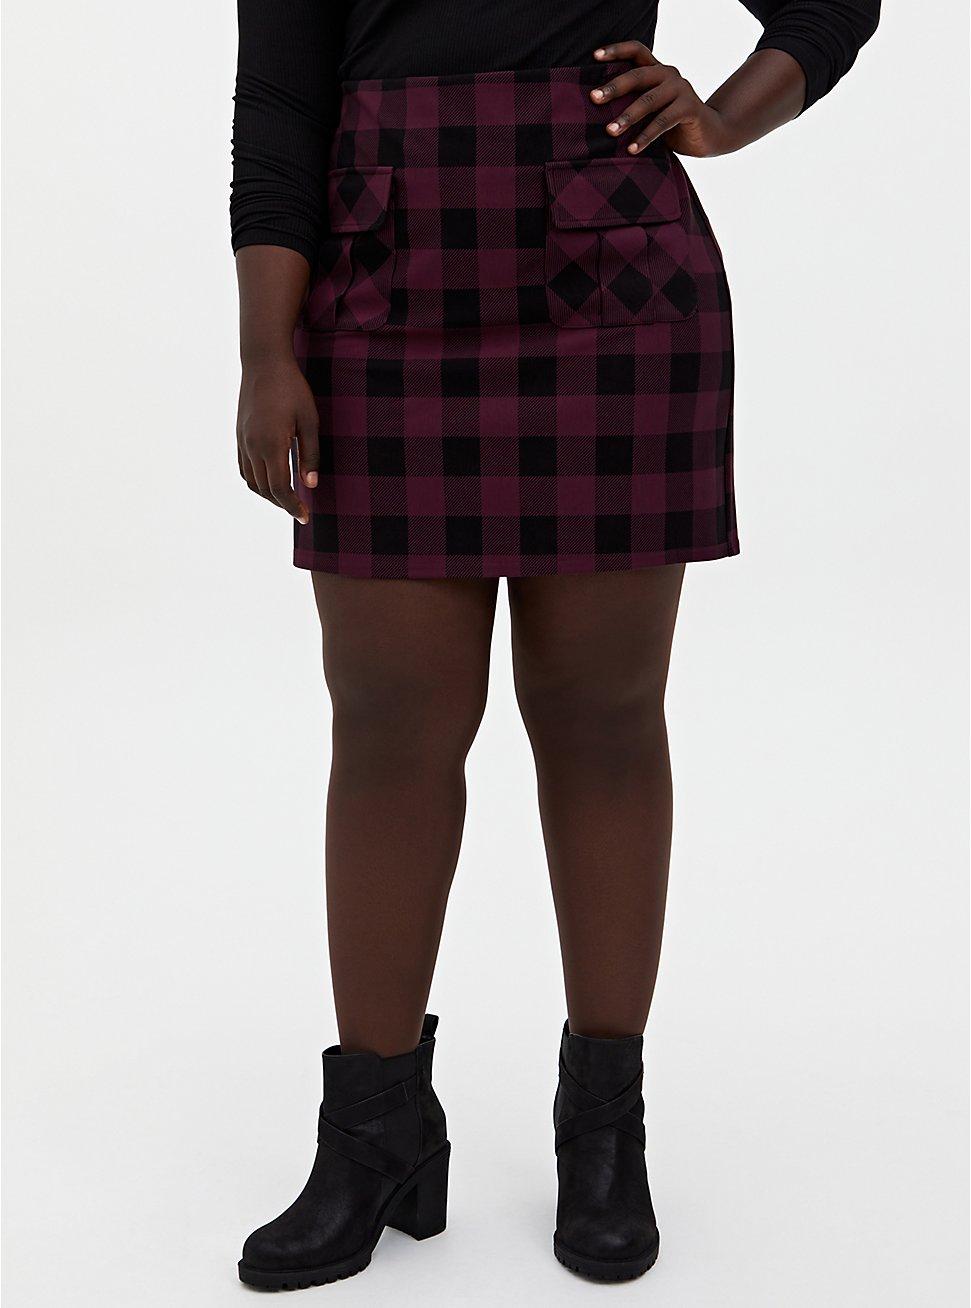 Burgundy Purple & Black Plaid Ponte Mini Skirt, PLAID - PURPLE, hi-res